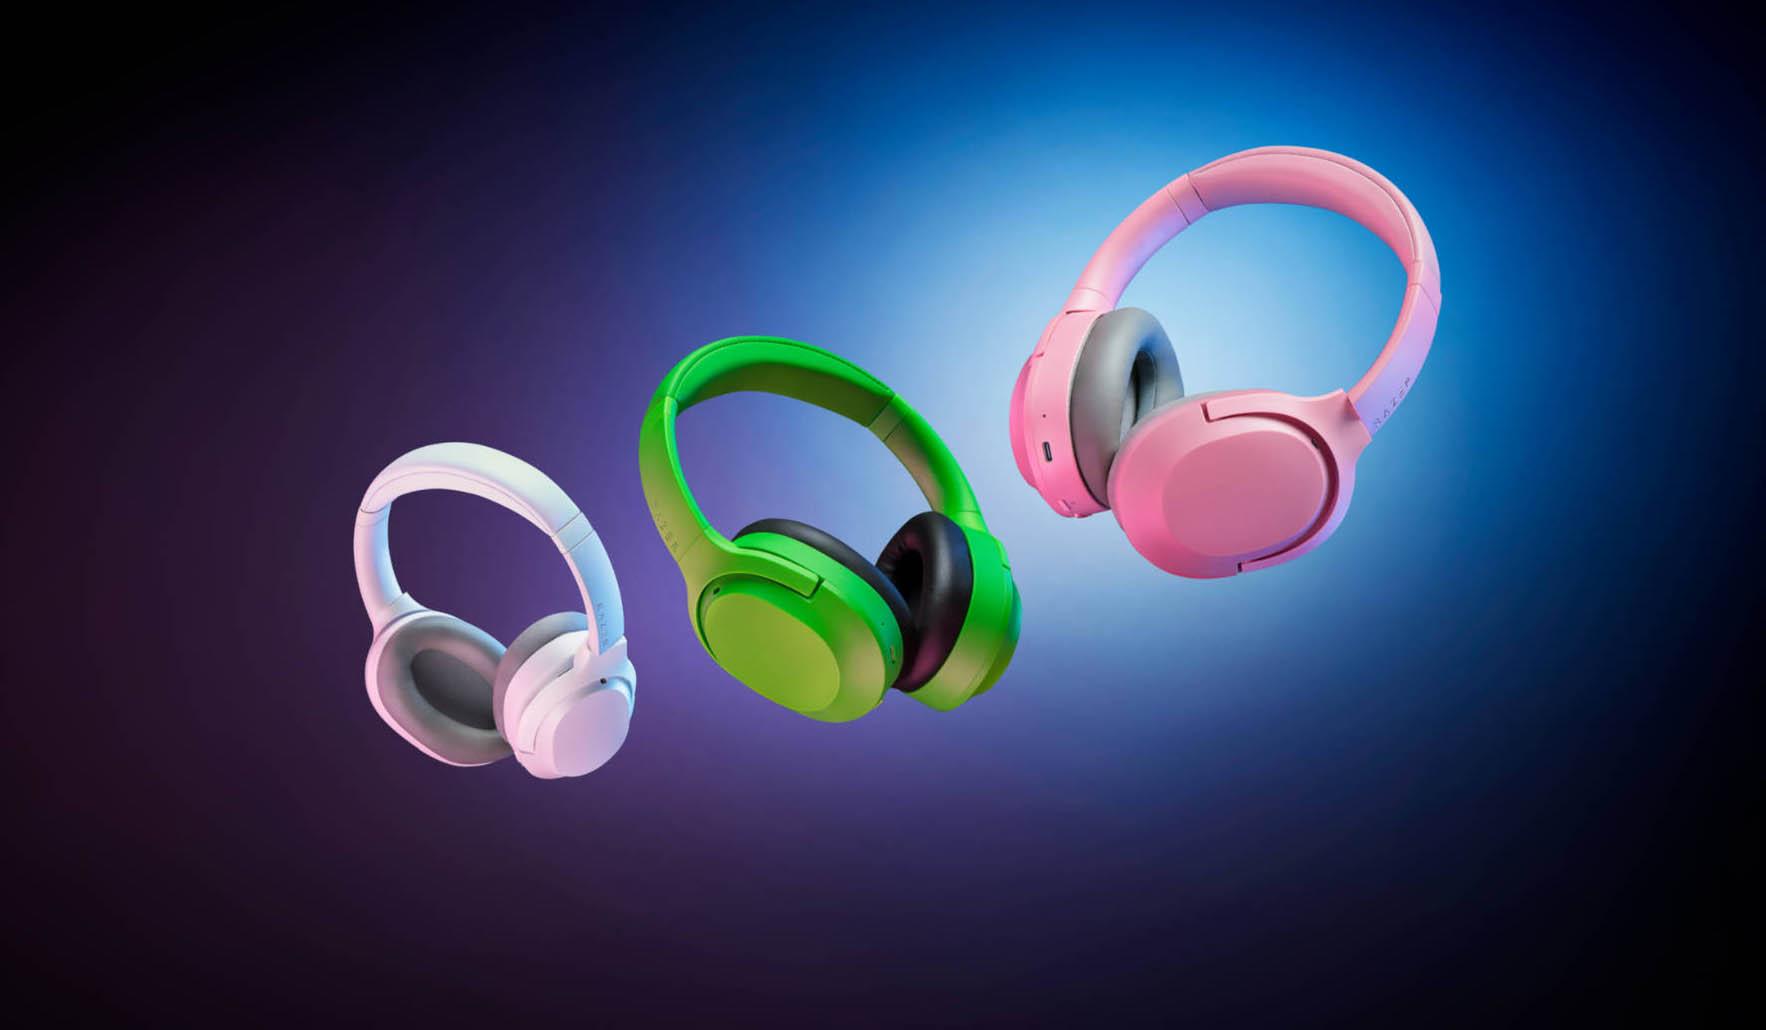 Razer's new ANC headphones slice the price of the original pair in half